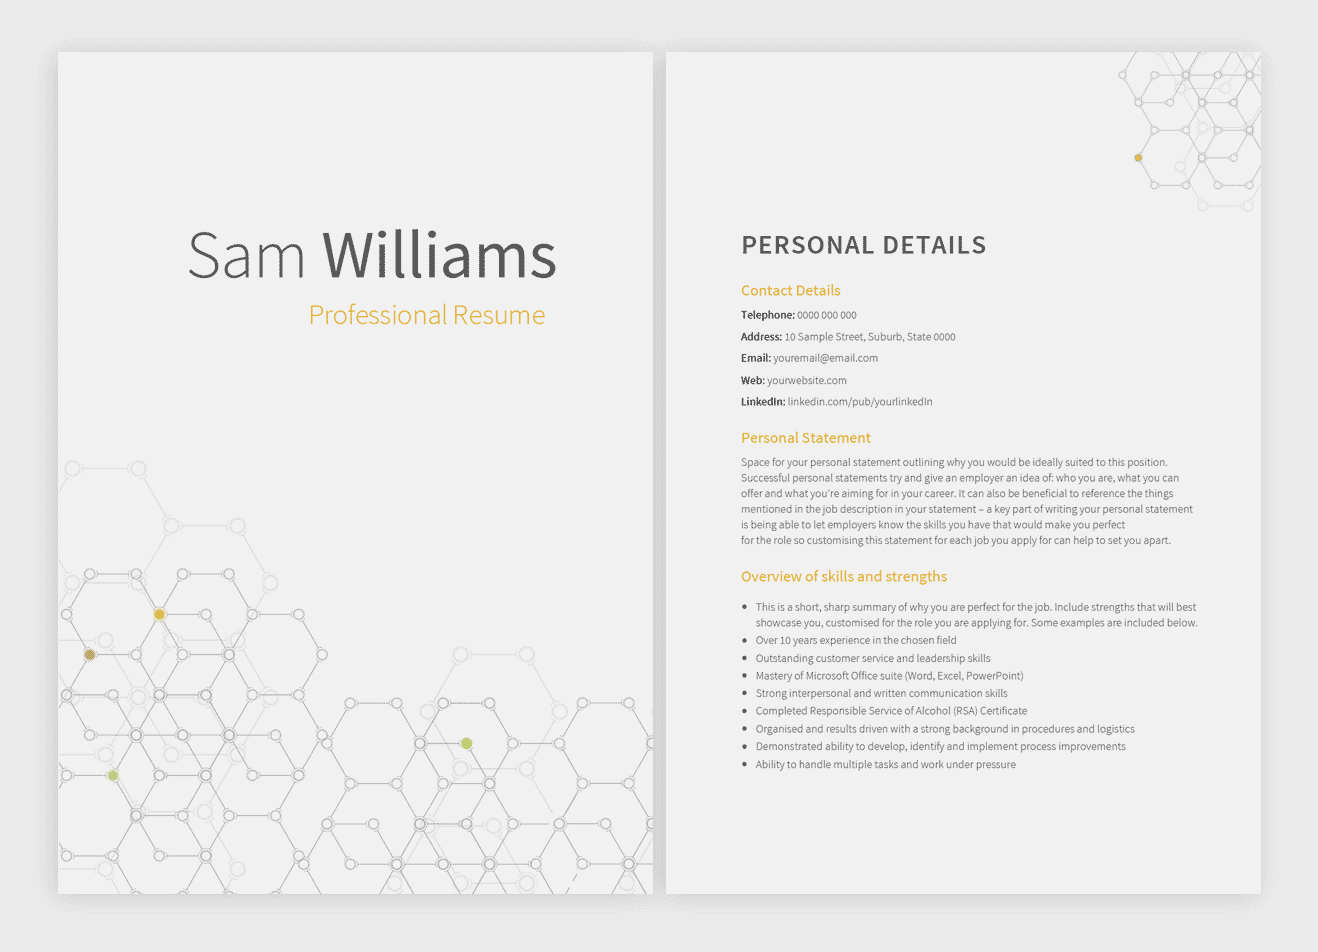 descartes-resume-template